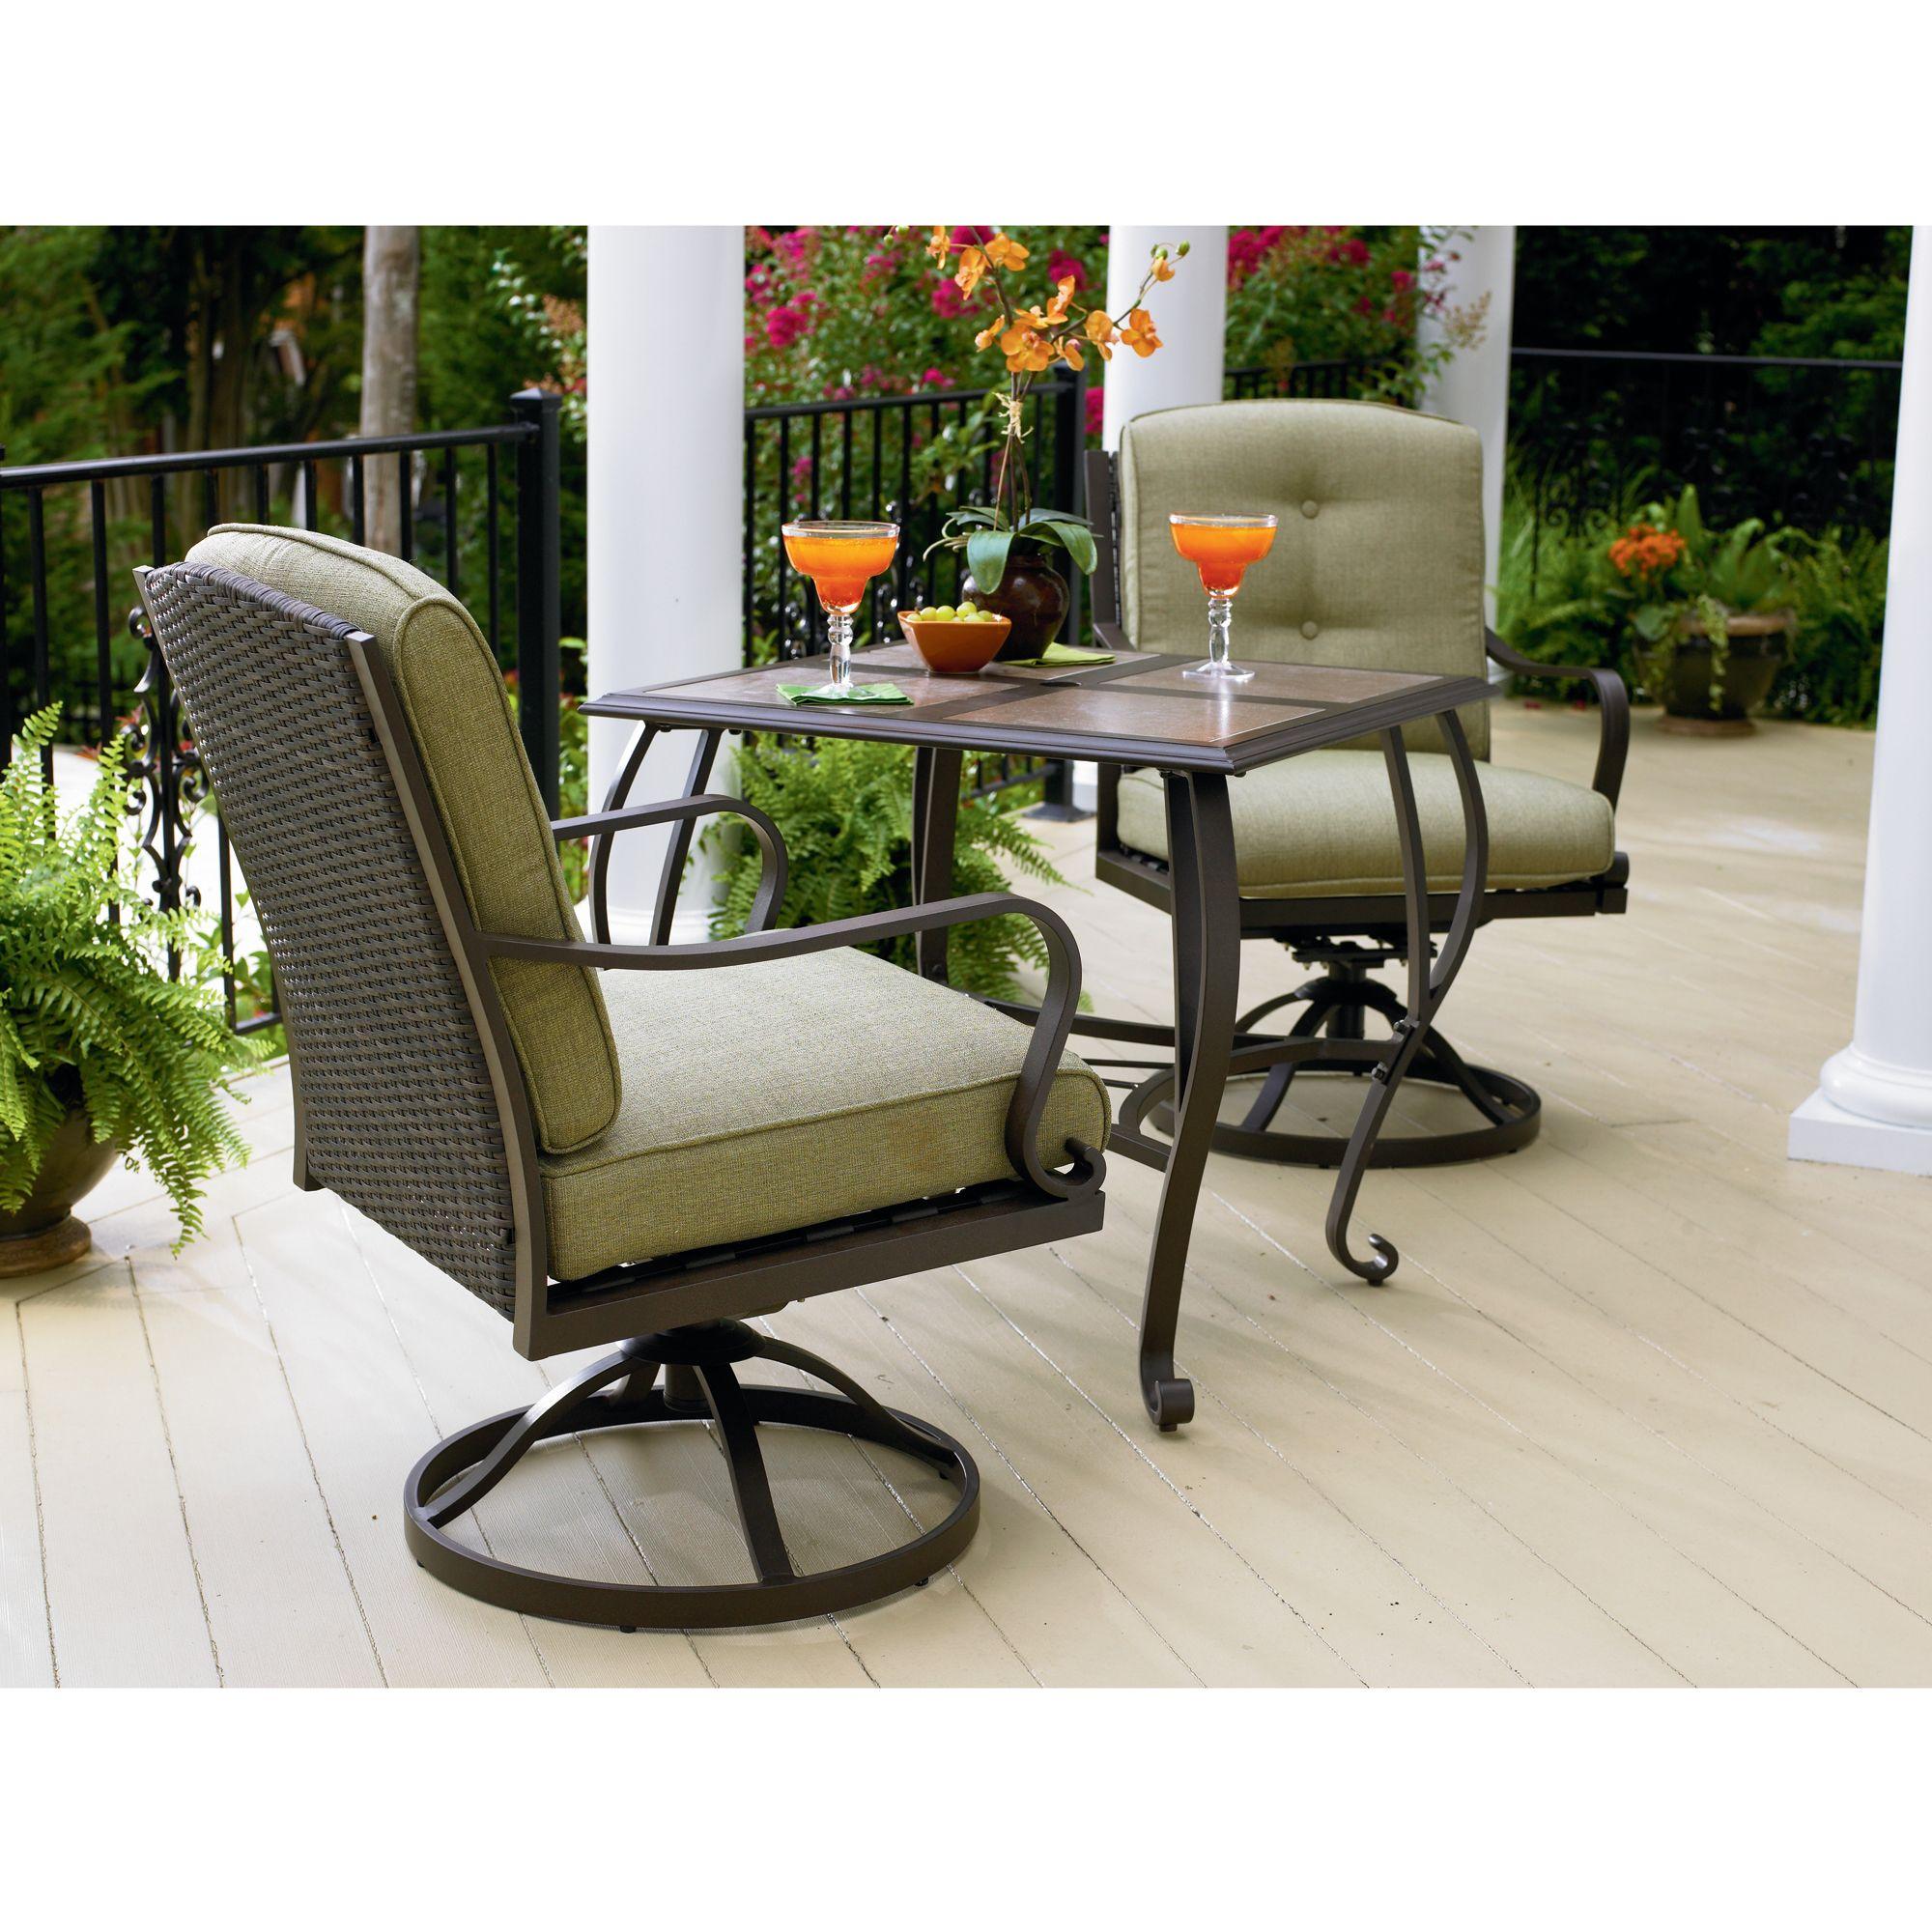 patio furniture bistro sets photo - 1